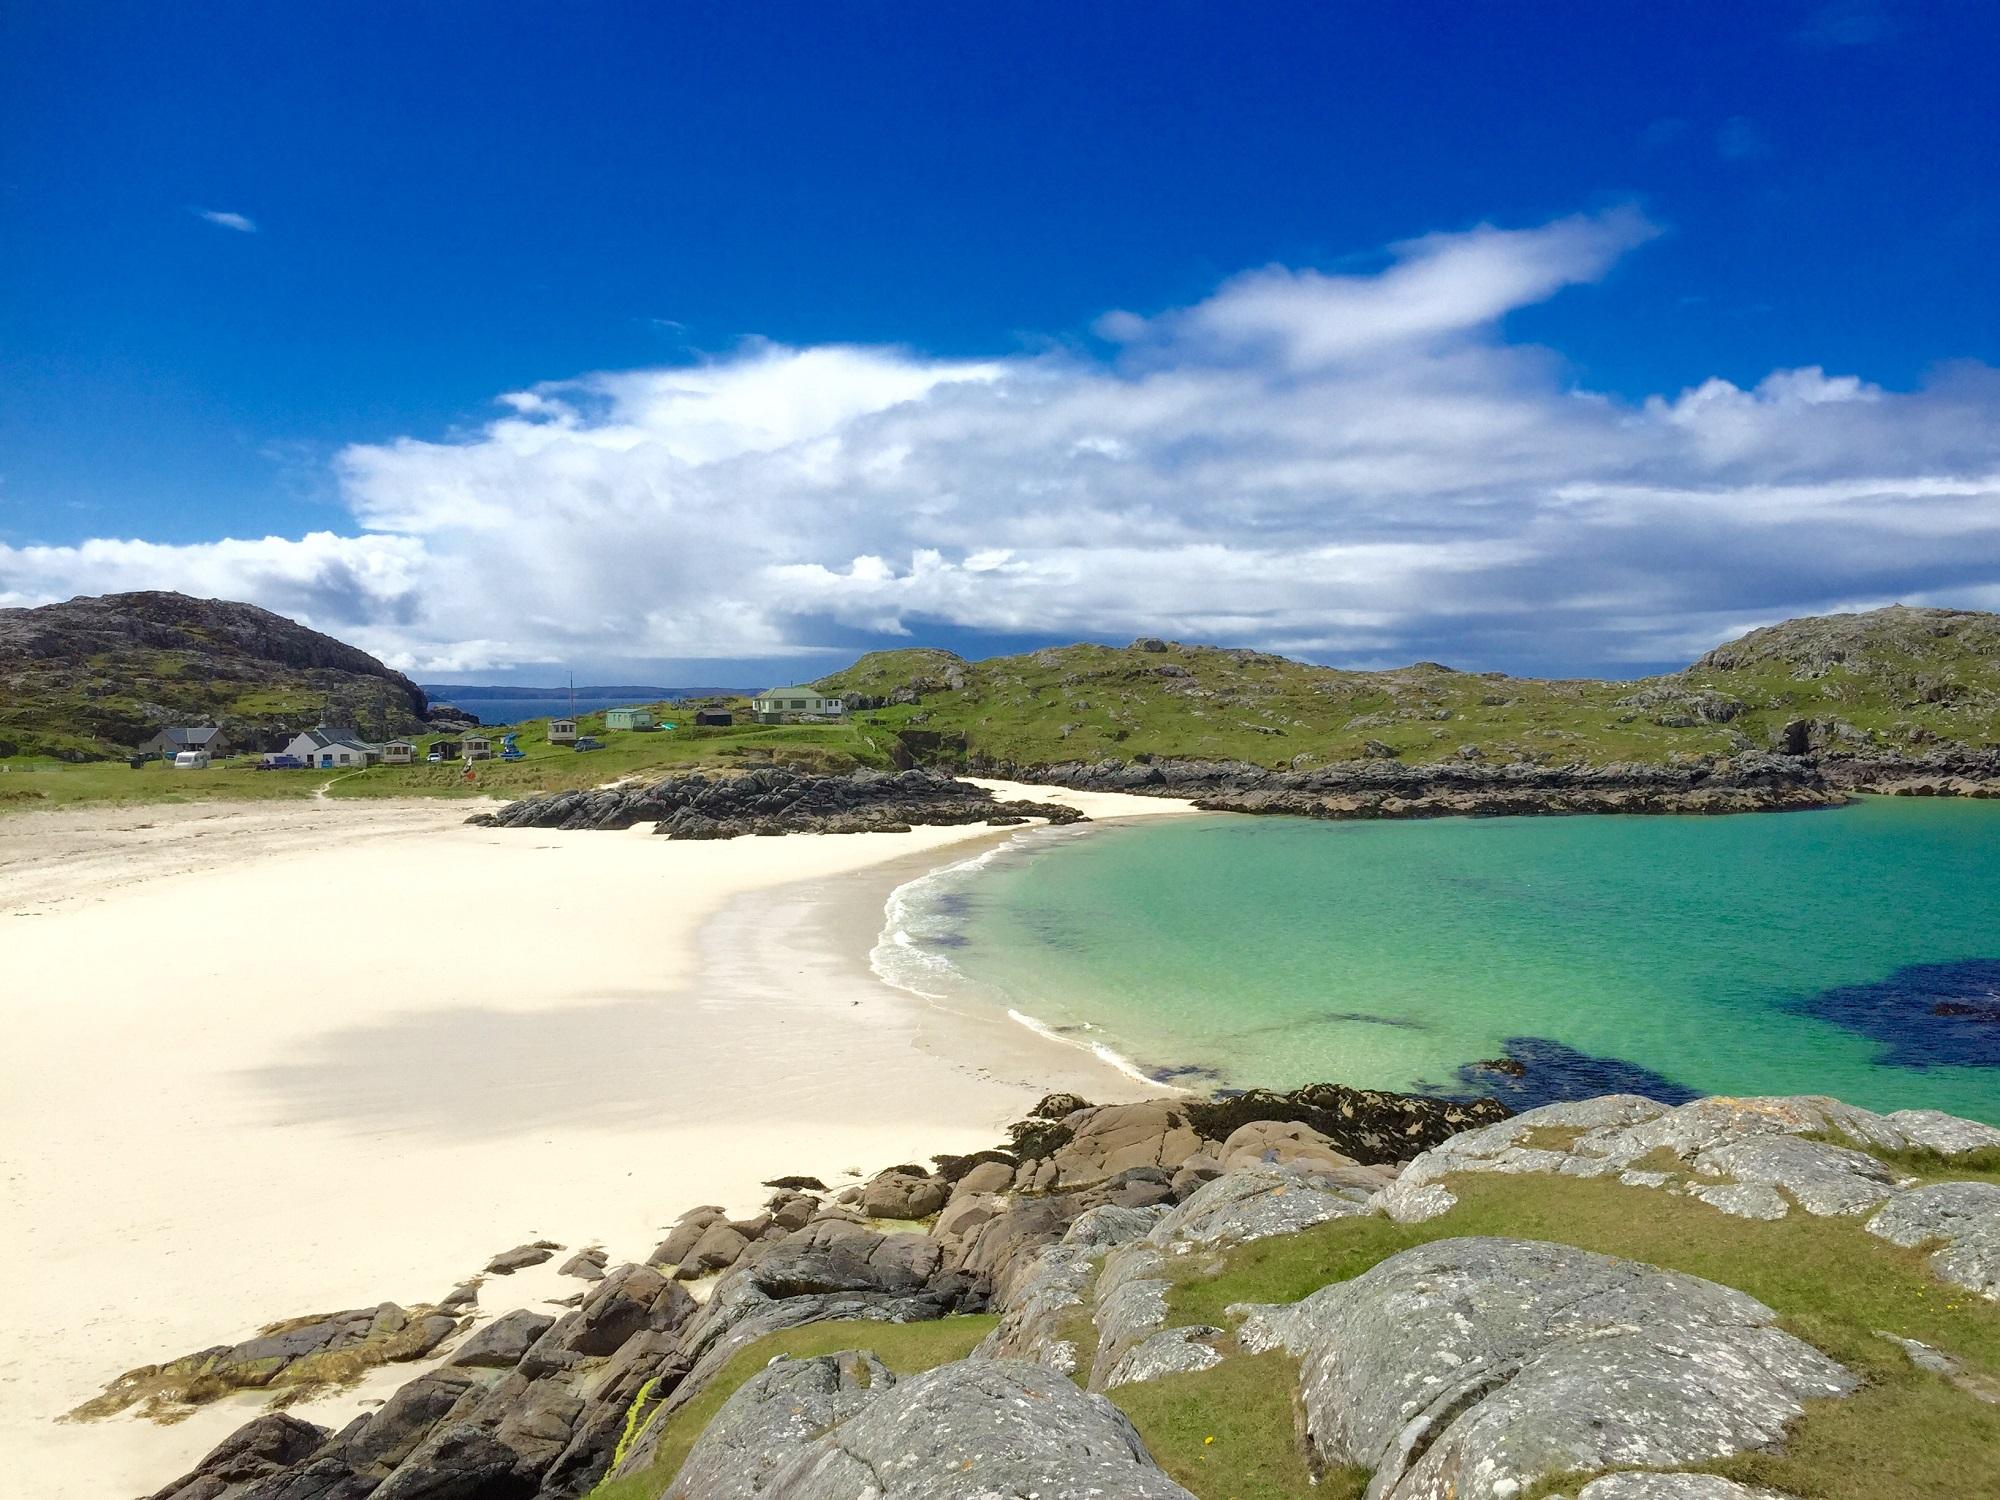 Top 12 beaches along the North Coast 500 - North Coast 500